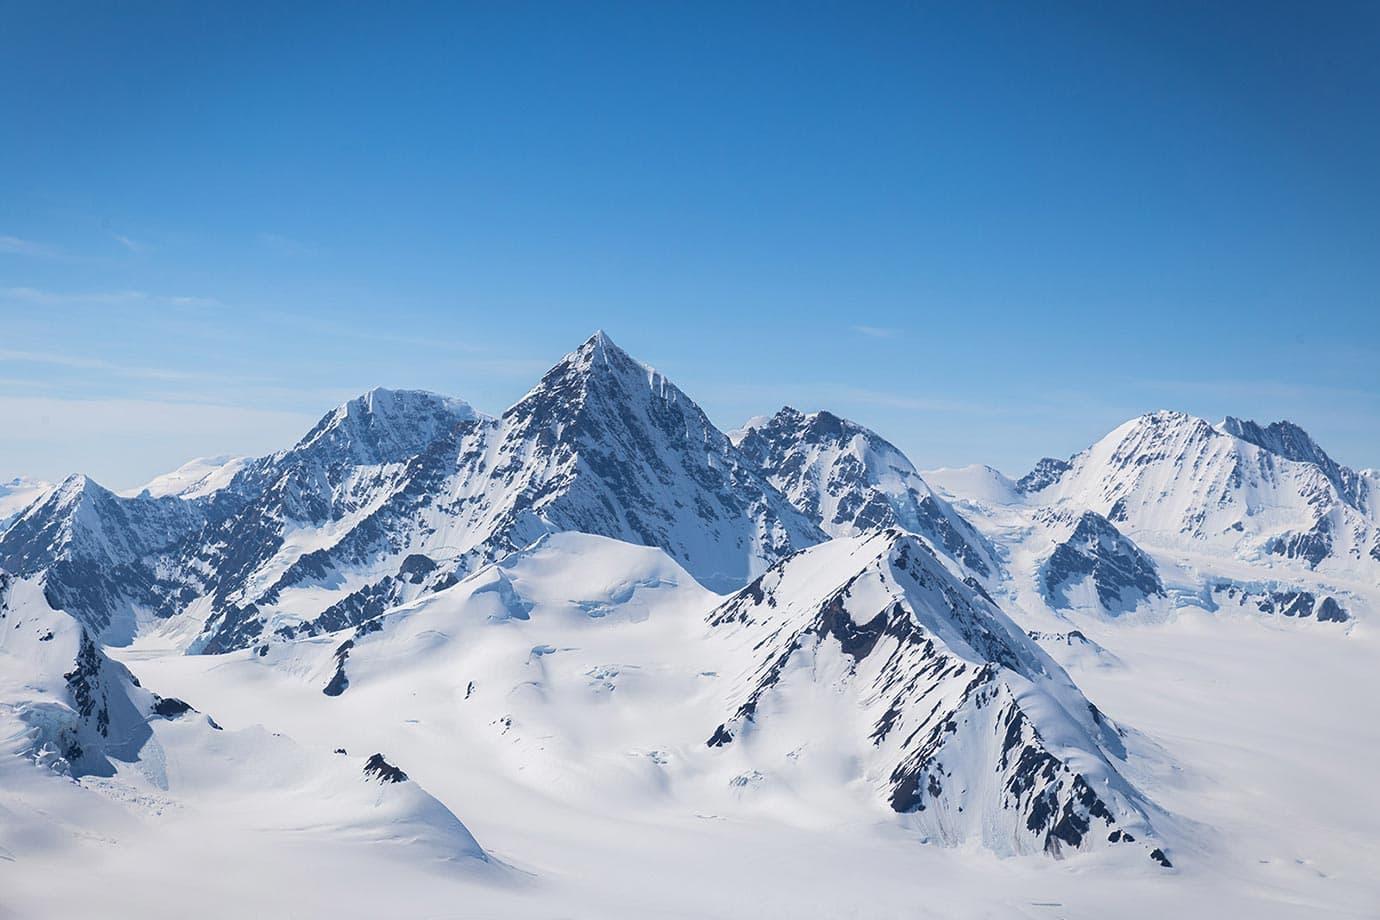 Mountains of Kluane National Park, Canada